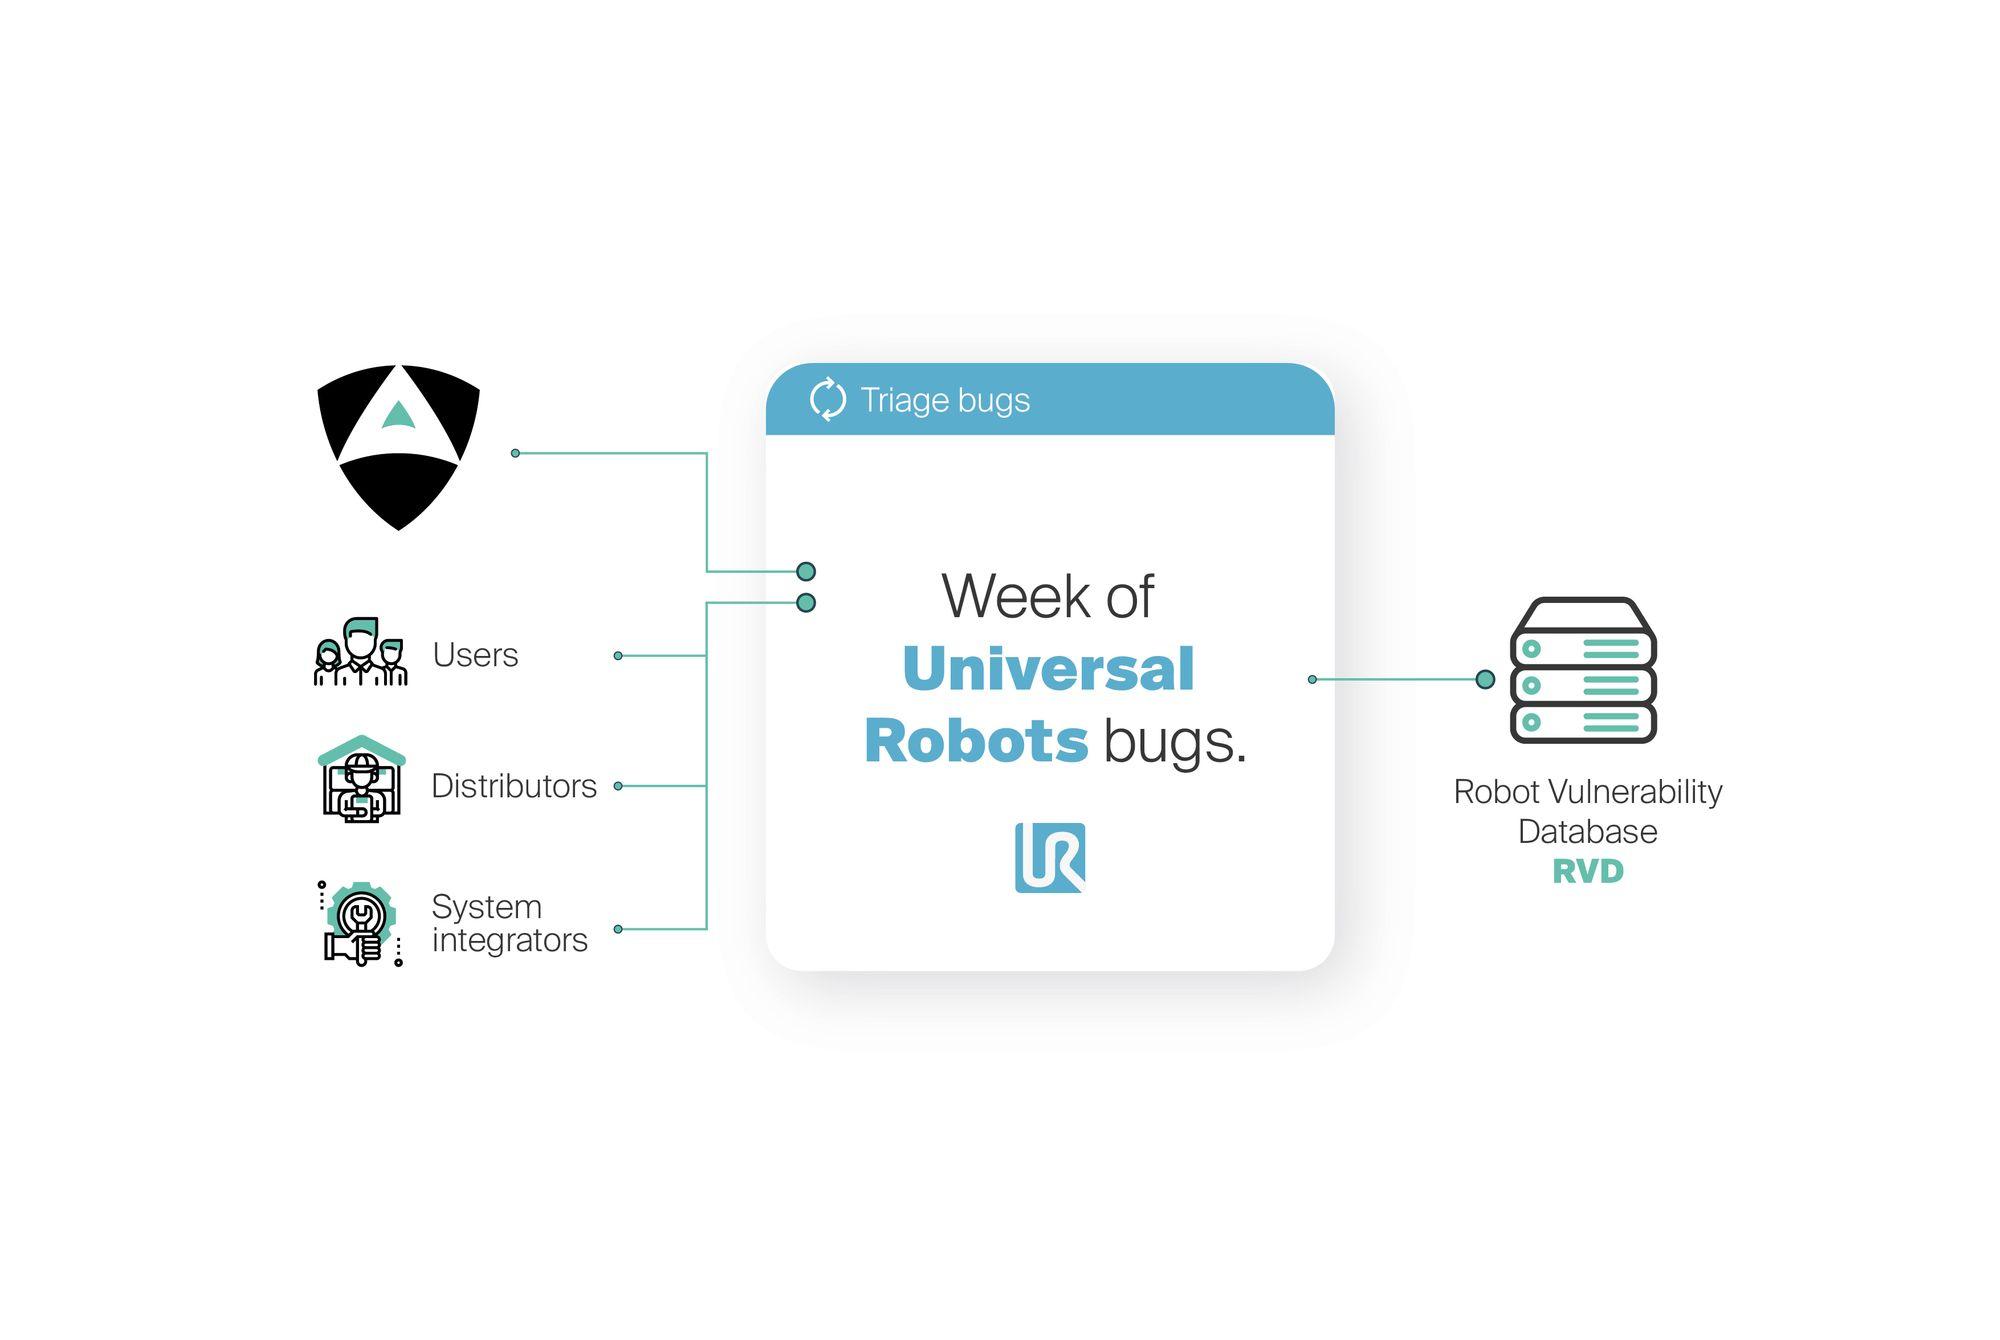 week_of_universal_robots_bugs_security